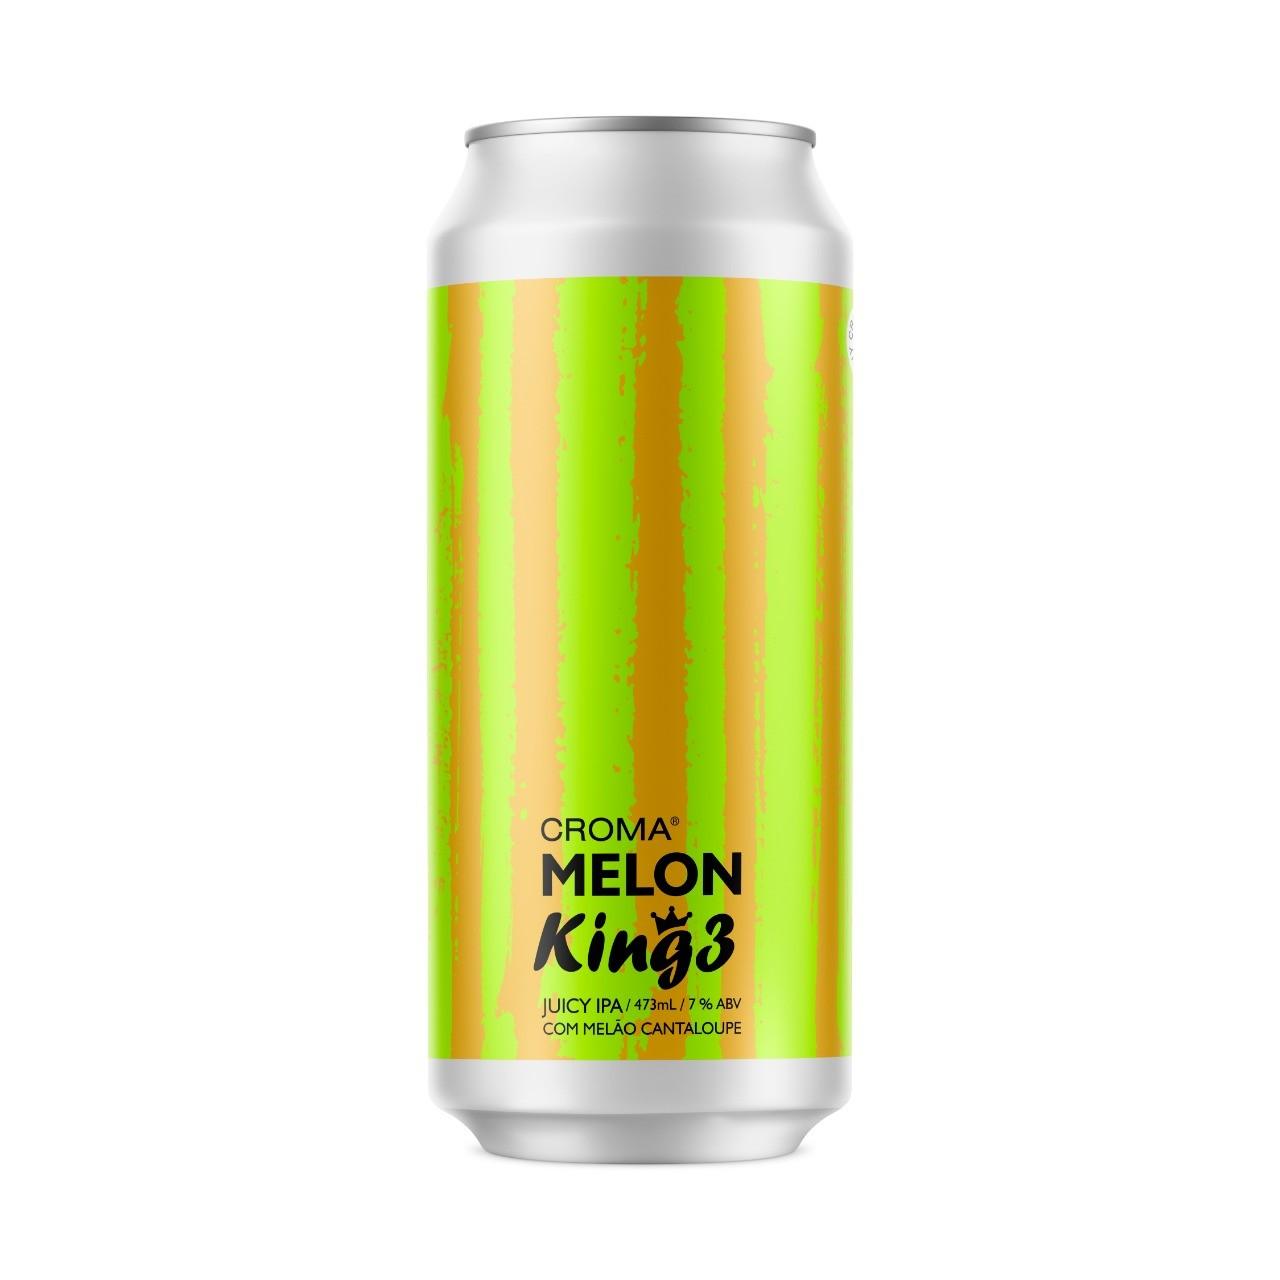 Croma Melon King 3 lata 473ml Juicy IPA